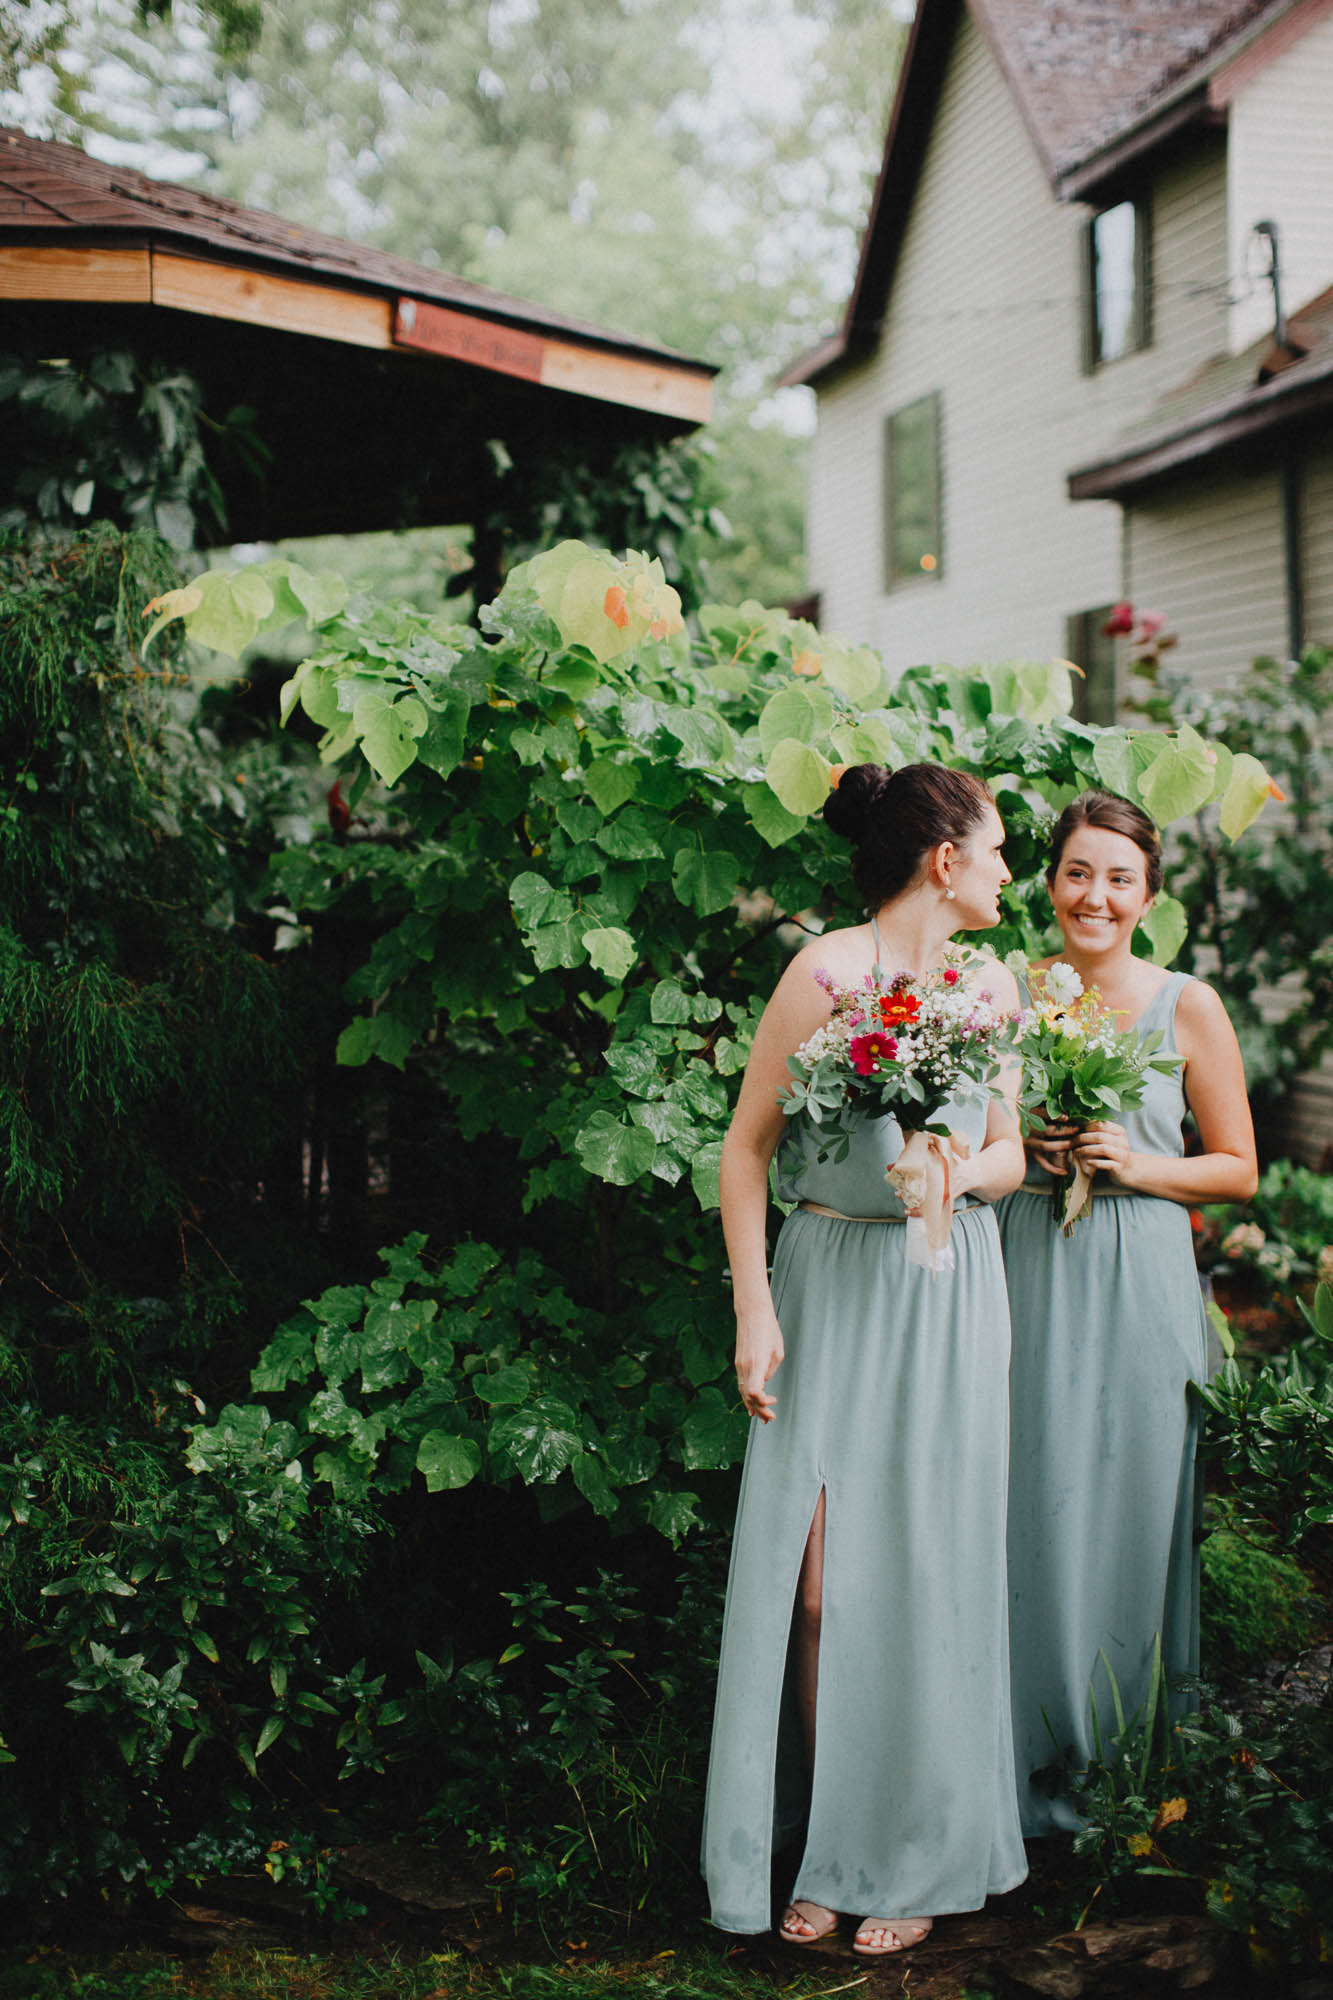 Leah-Graham-Michigan-Outdoor-DIY-Wedding-045@2x.jpg